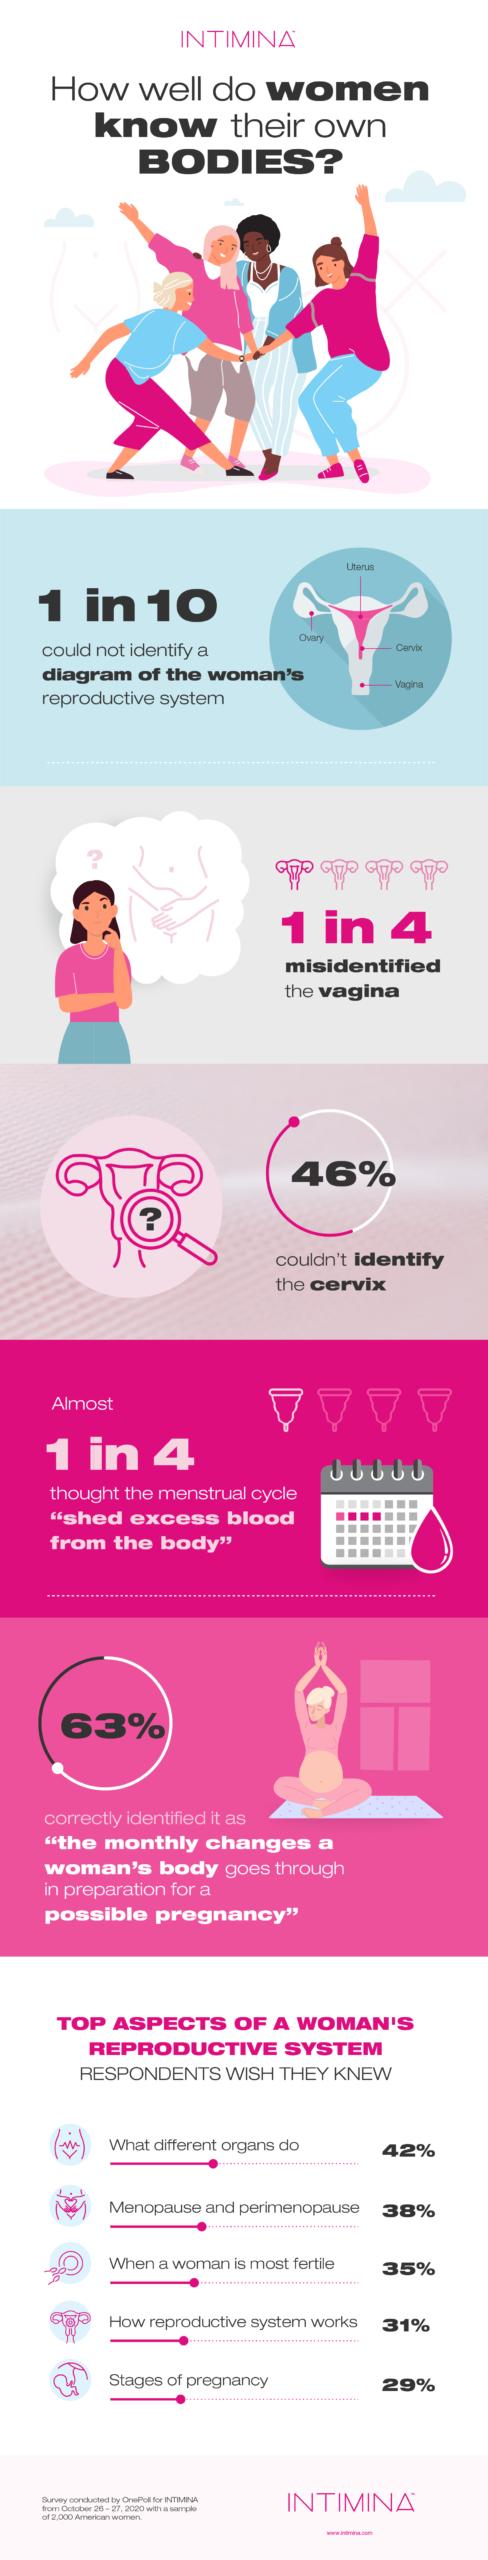 Intimina Women Bodies Infographic